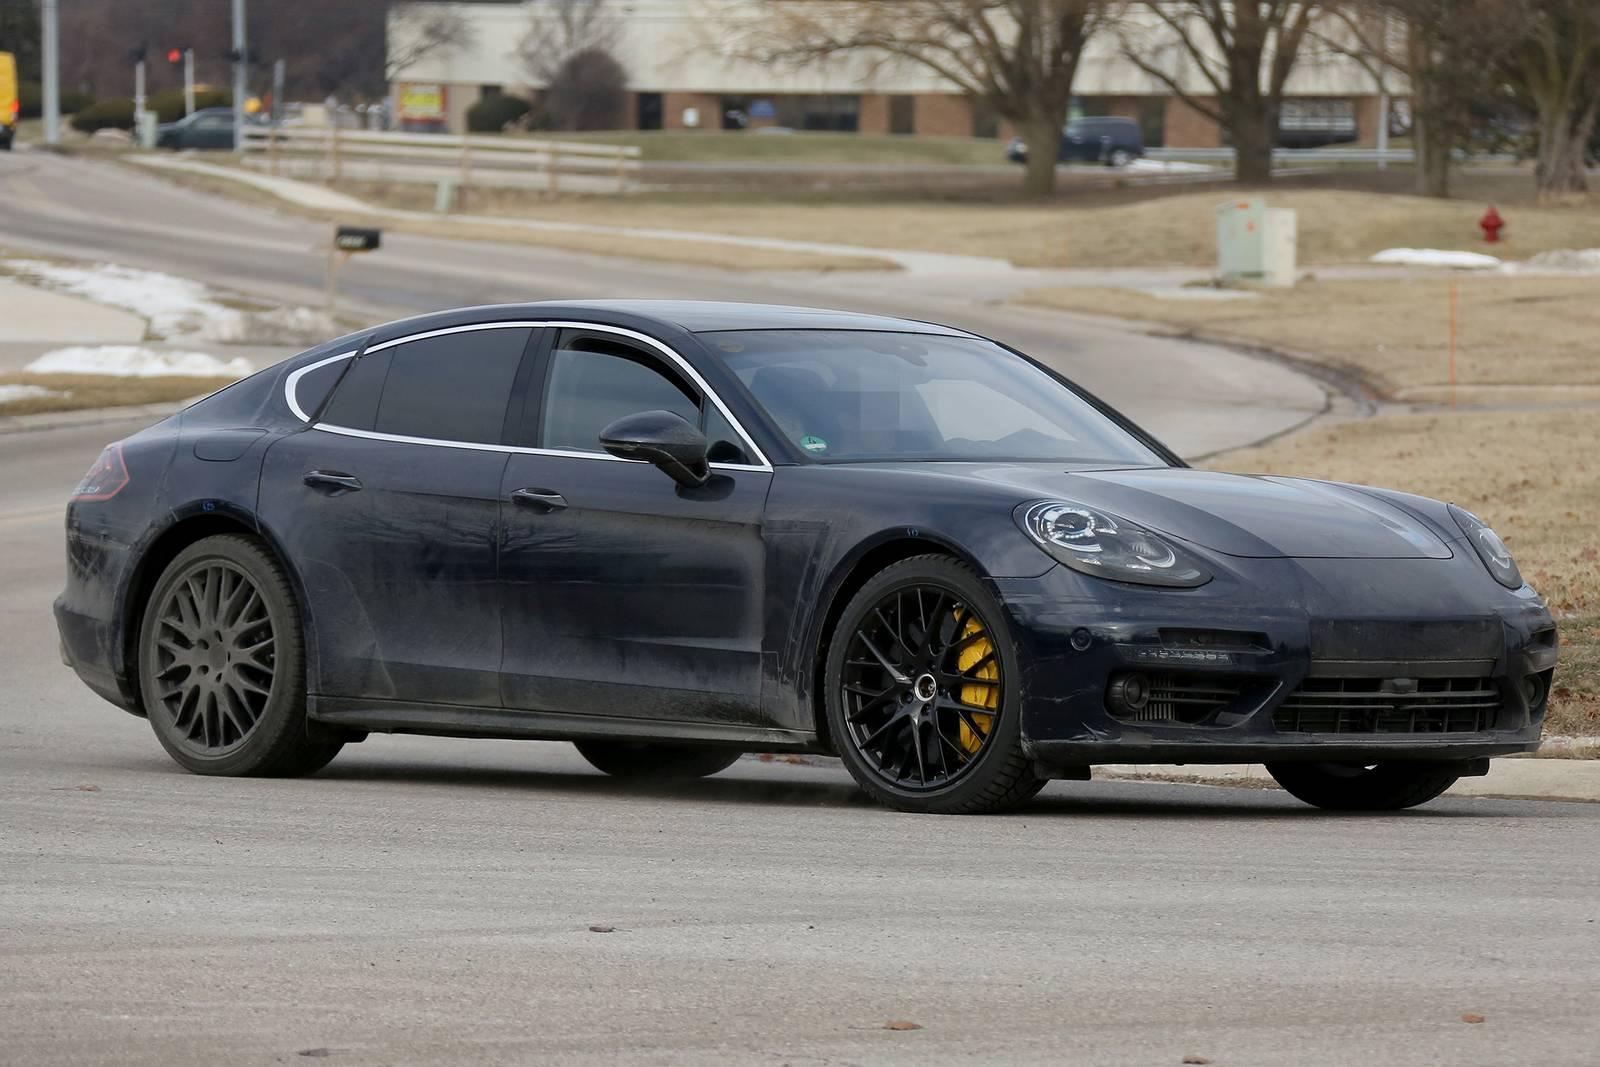 2018 porsche panamera shooting brake latest spy shots gtspirit -  Porsche Panamera First Interior Spy Shots Supercar